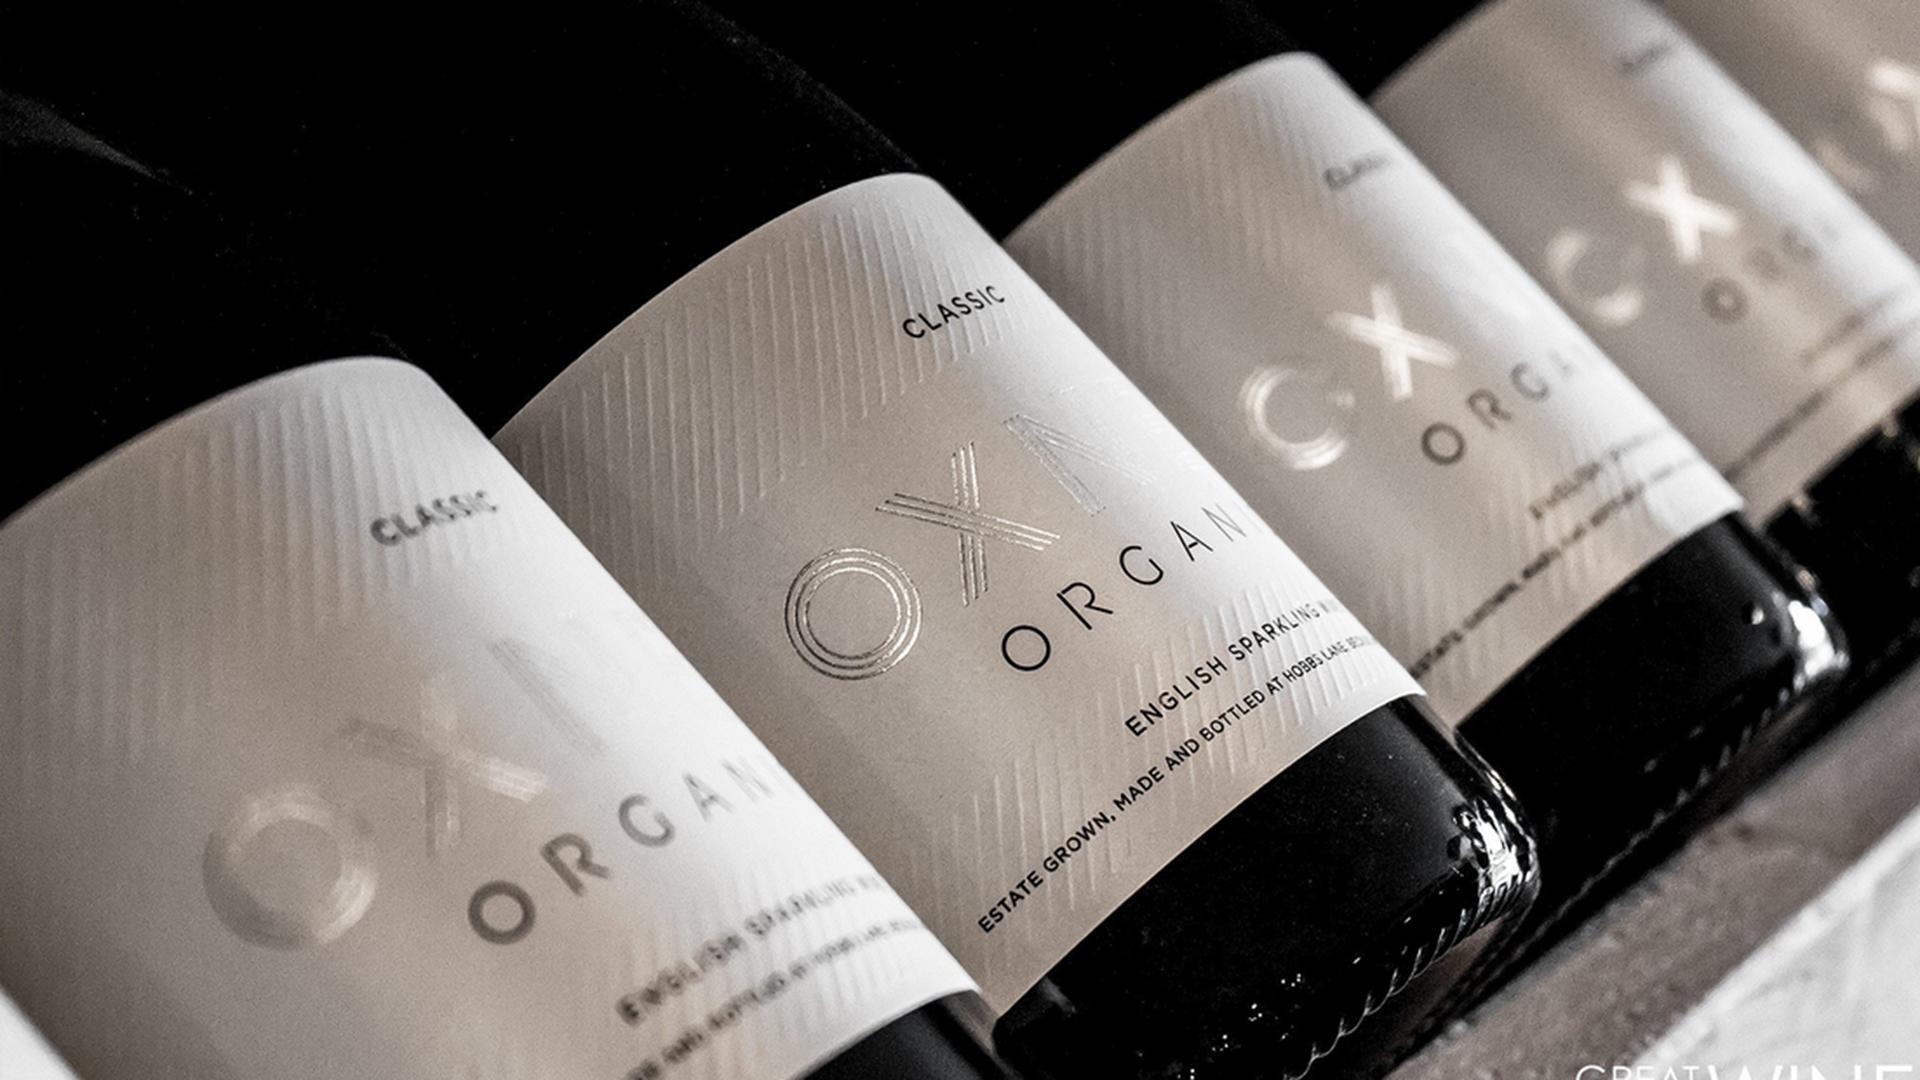 oxney organic estate logo corporate identity label design